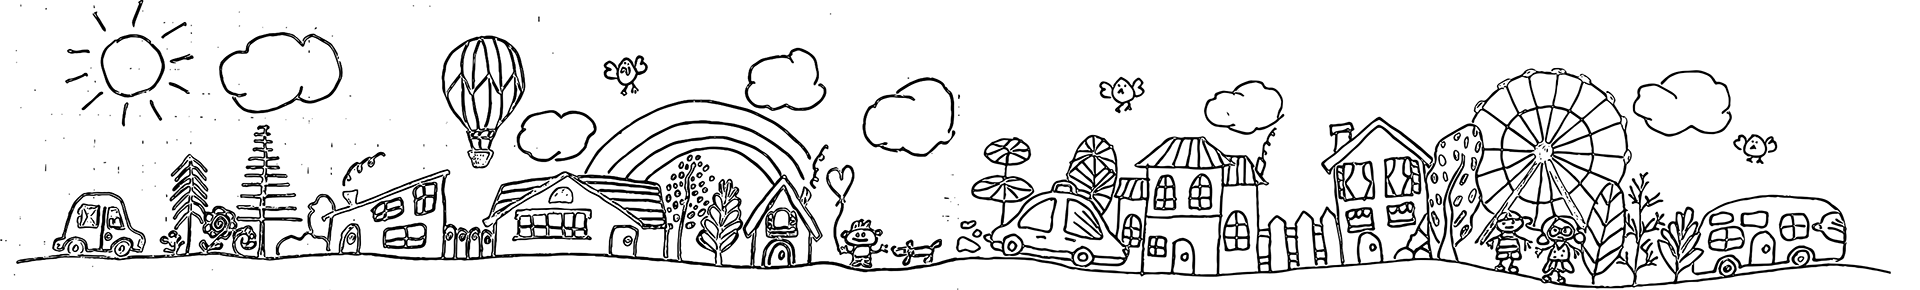 myarea community